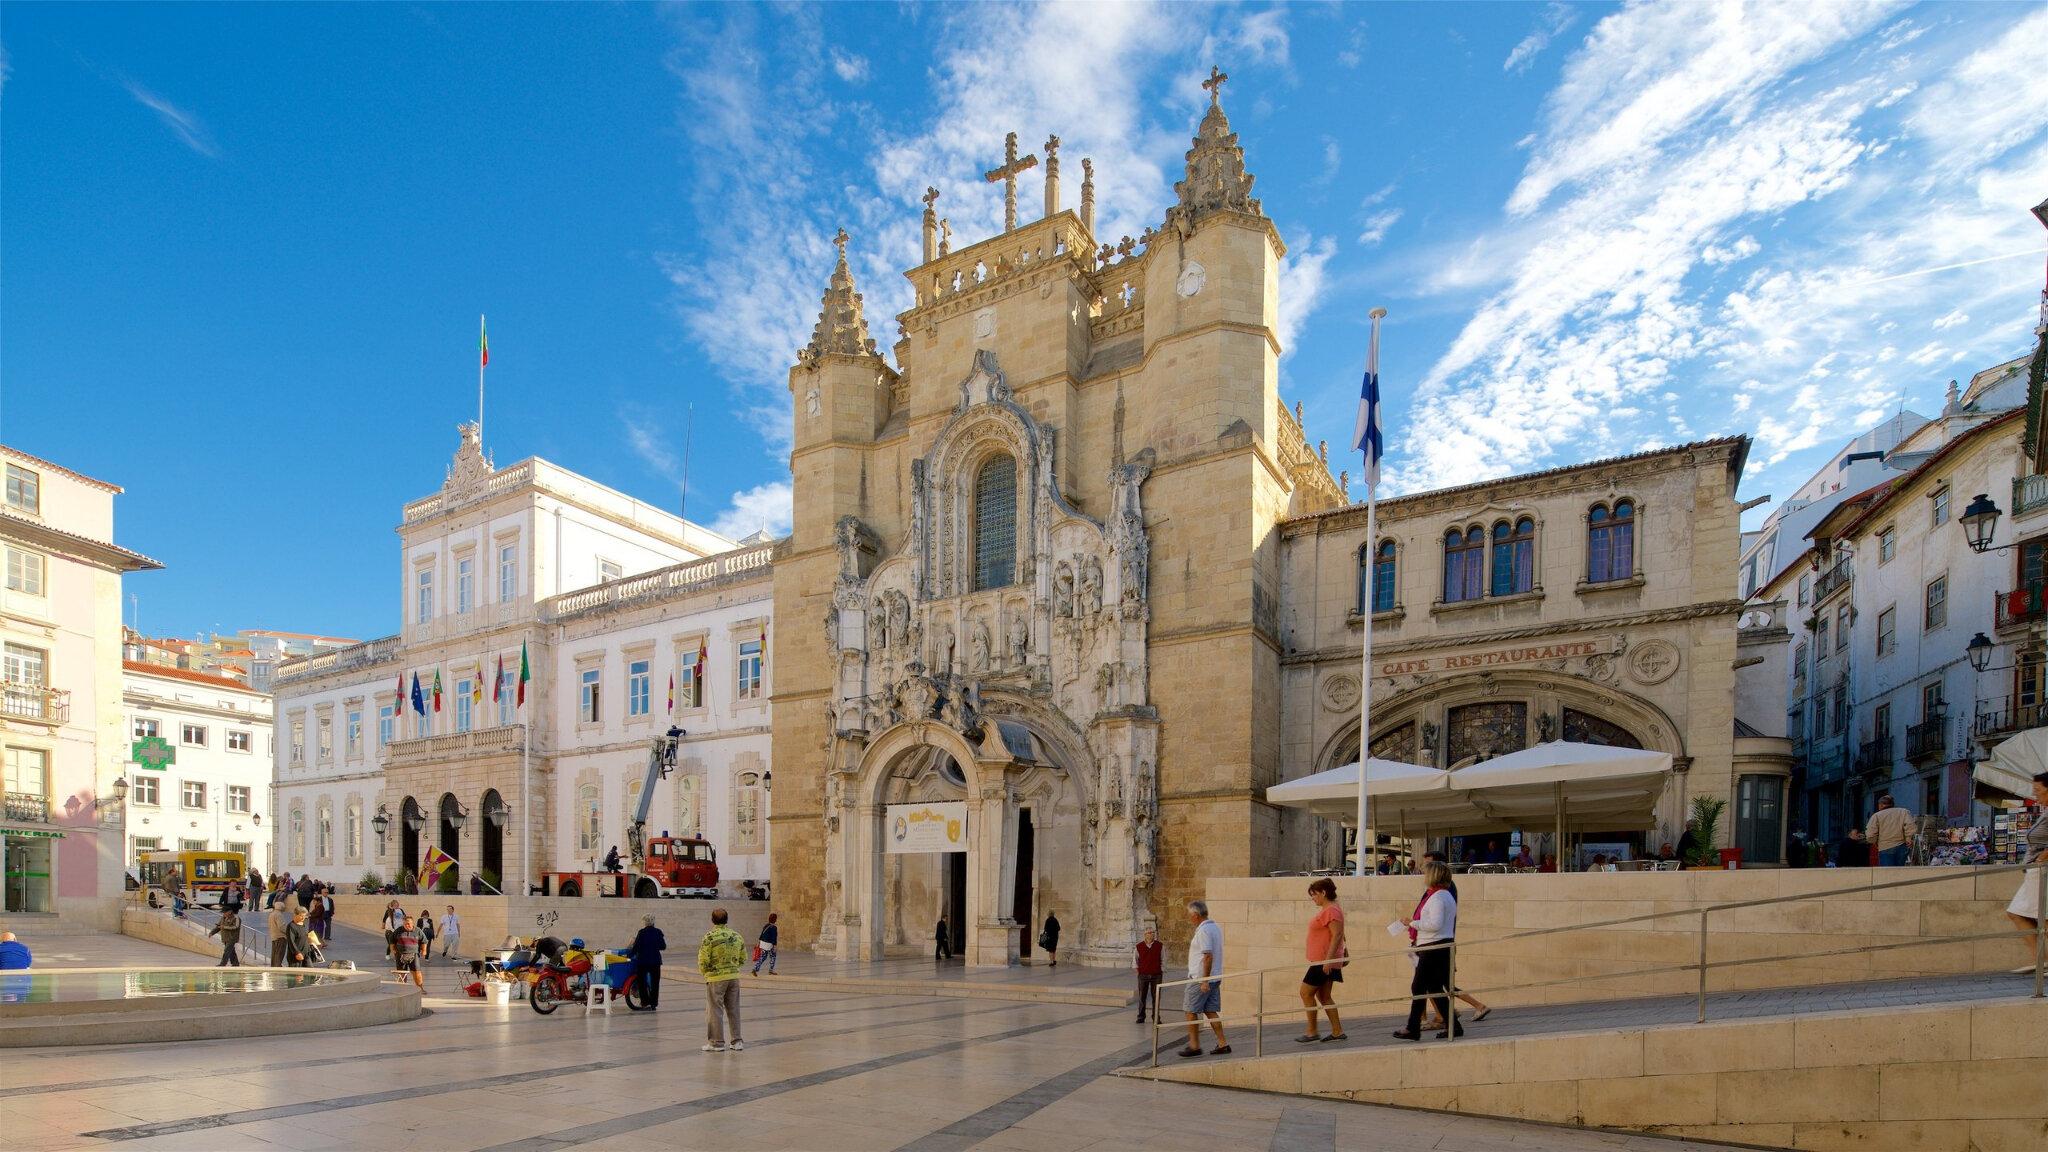 Le monastère de Santa Cruz, à Coimbra